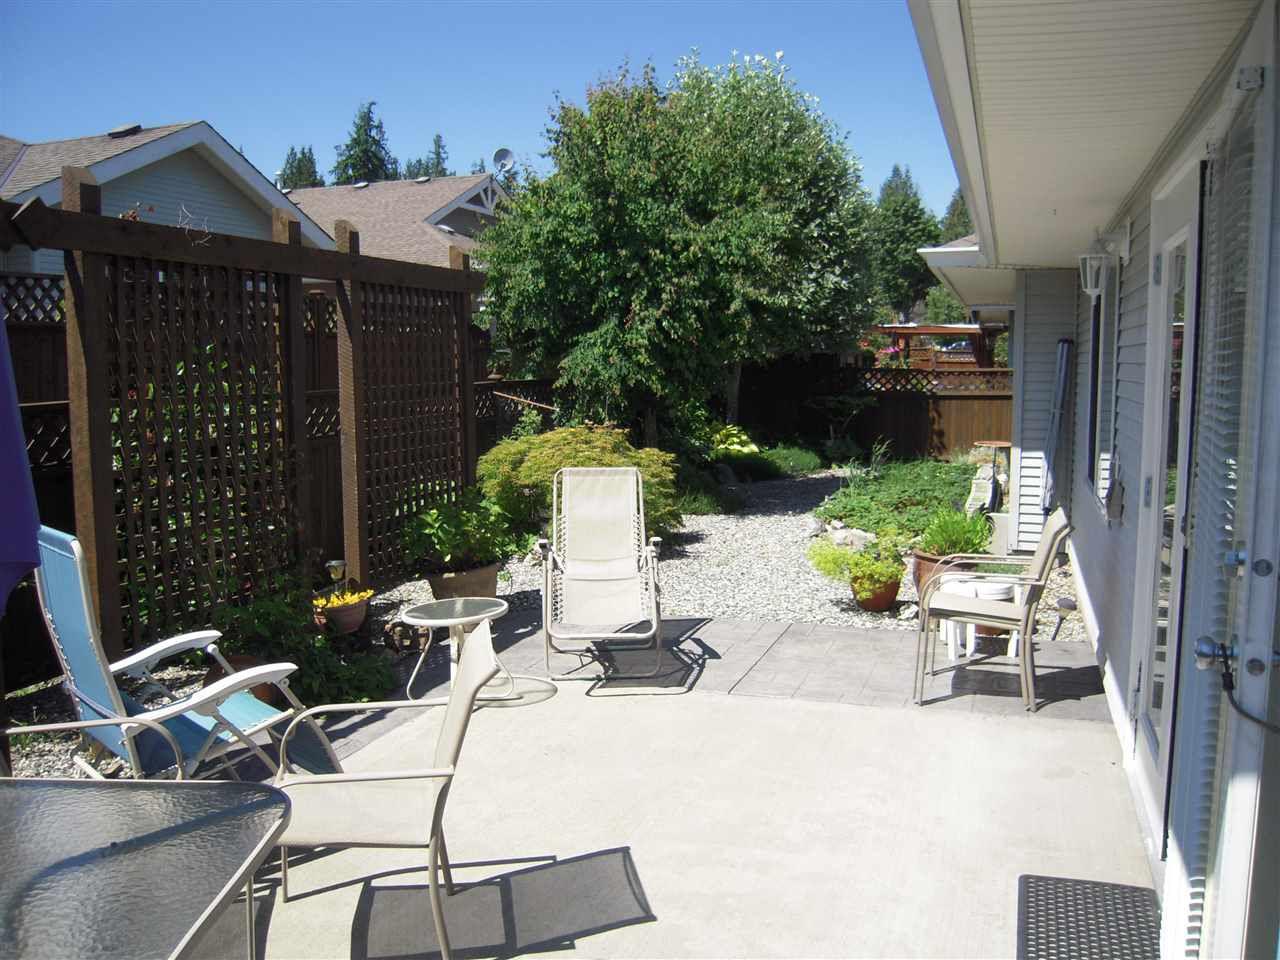 Photo 6: Photos: 5735 EMILY Way in Sechelt: Sechelt District House for sale (Sunshine Coast)  : MLS®# R2179124